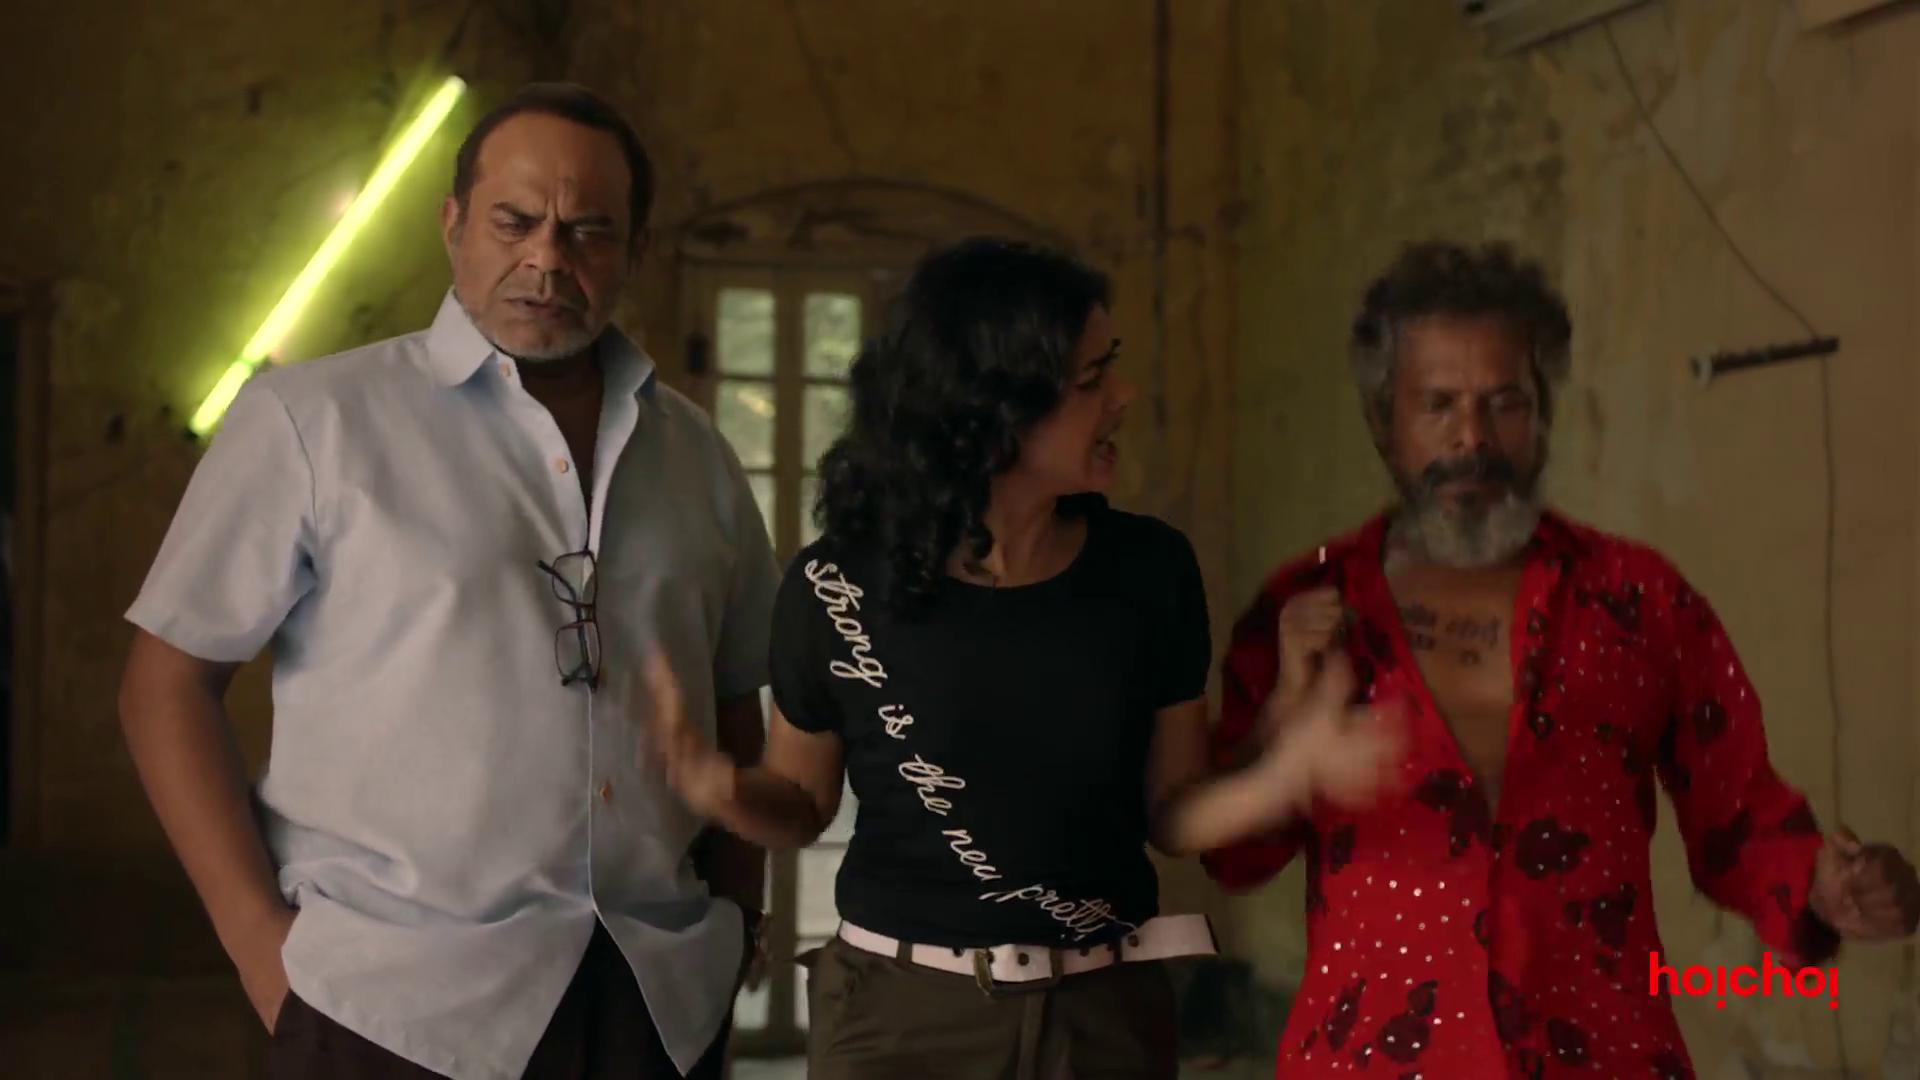 Dhanbad Blues (2019) Hindi - 1080p - WEB-DL - AVC - AAC-Team IcTv Exclusive 18+